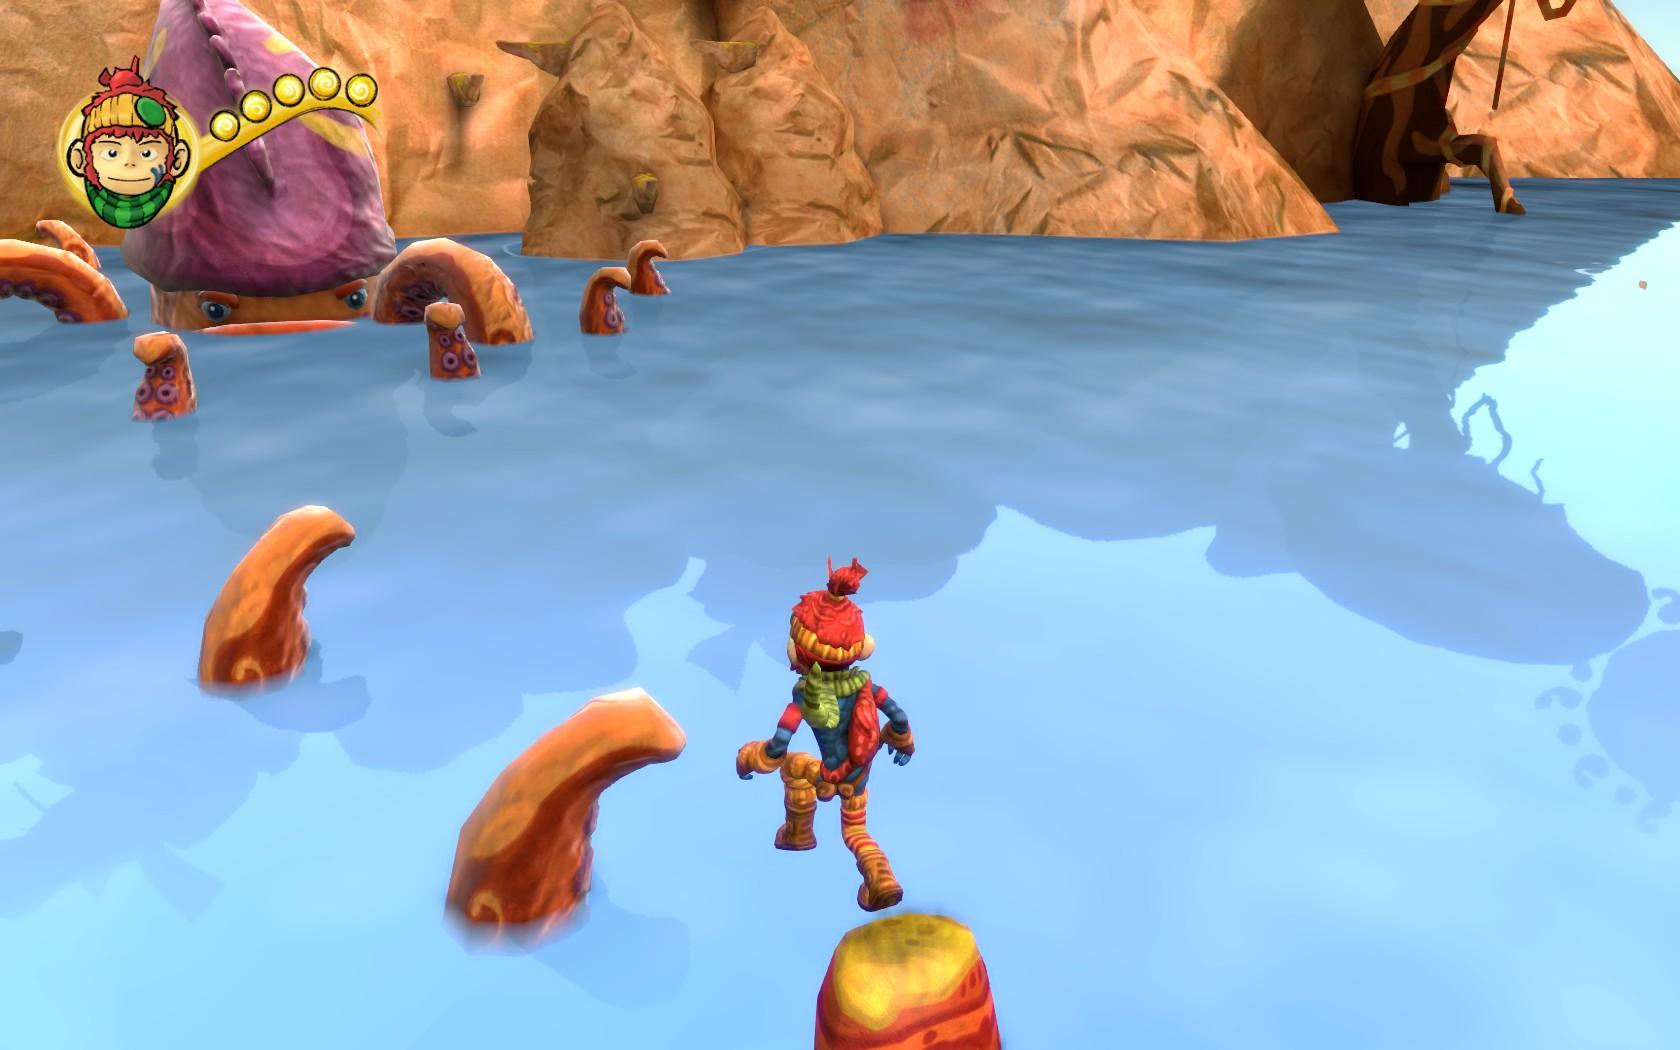 The-Last-Tinker-Koru-Jumping